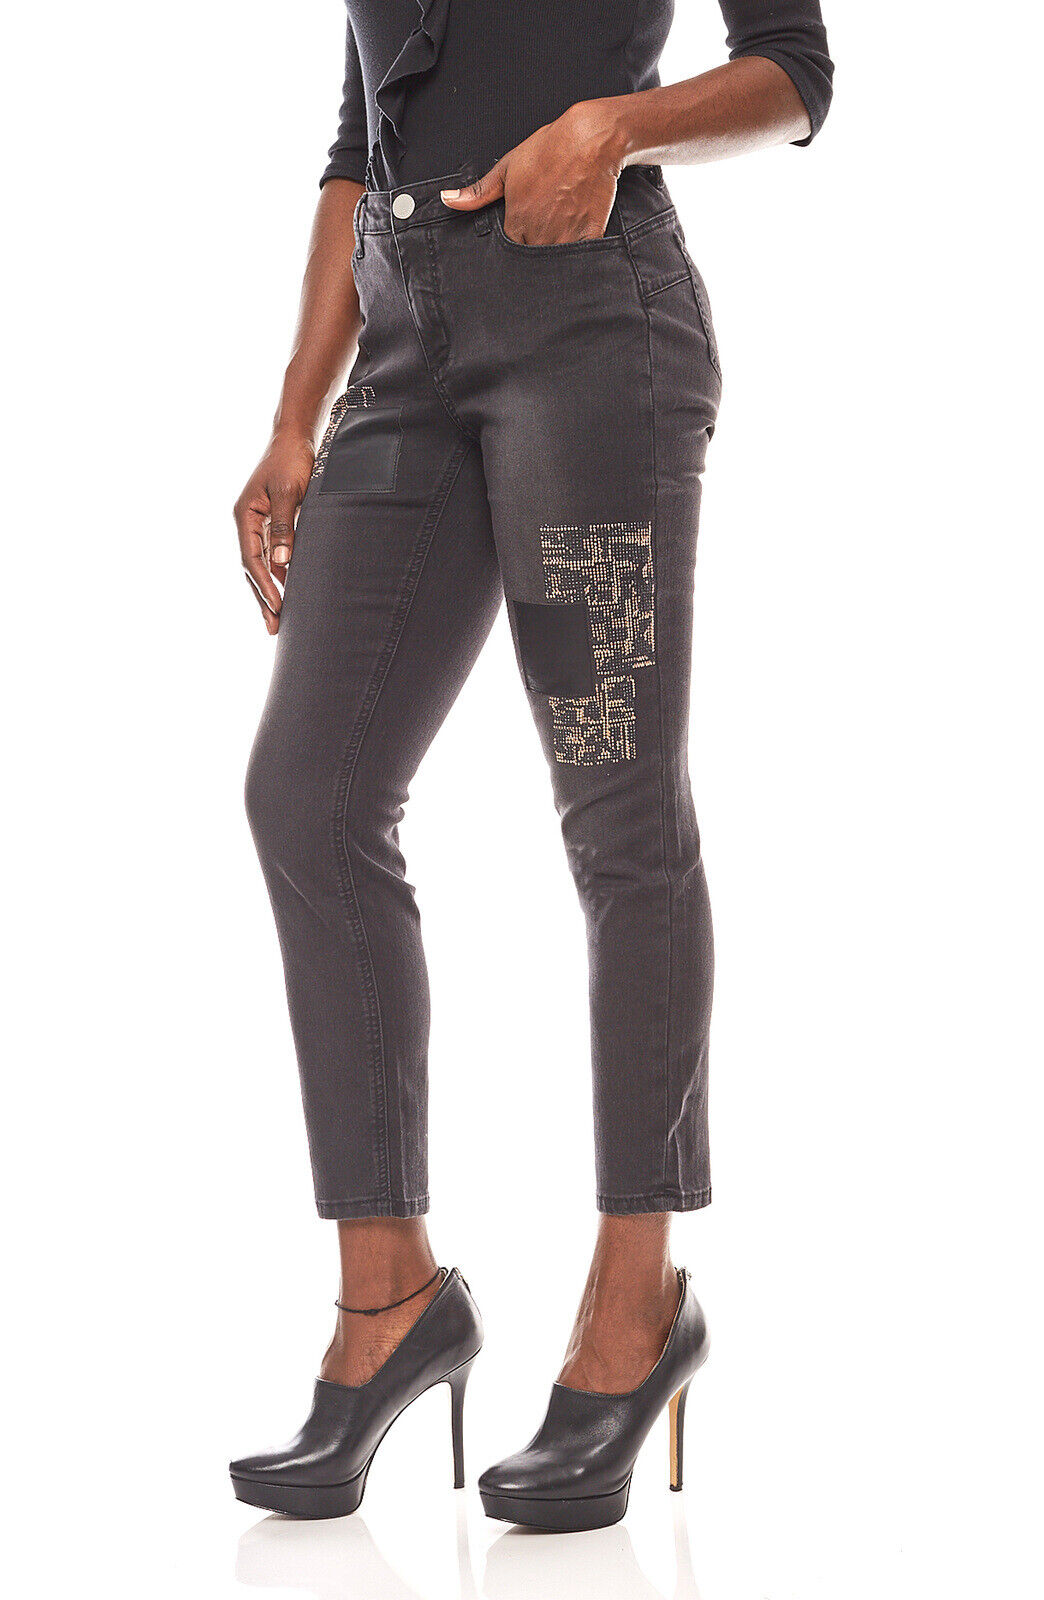 rick cardona Röhren Jeans-Hose mit Pailletten Trend enge Hose Kurzgröße Schwarz